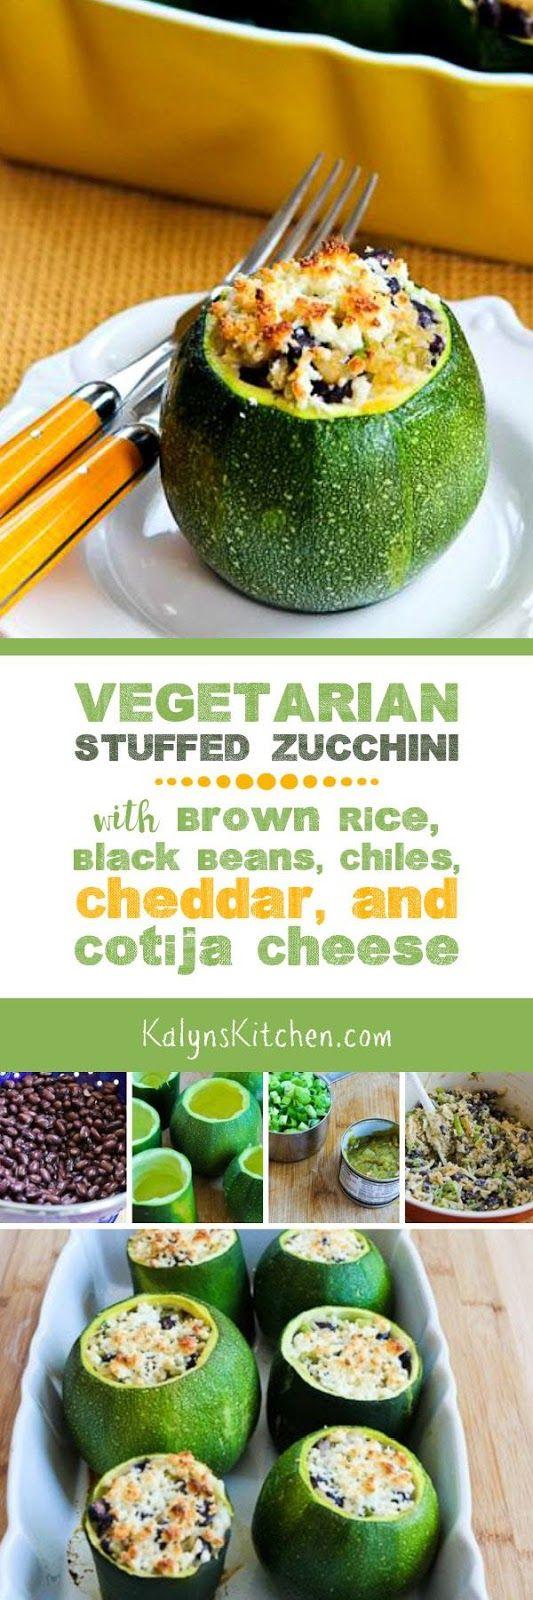 Healthy Recipes : Vegetarian Stuffed Zucchini Recipe with ...